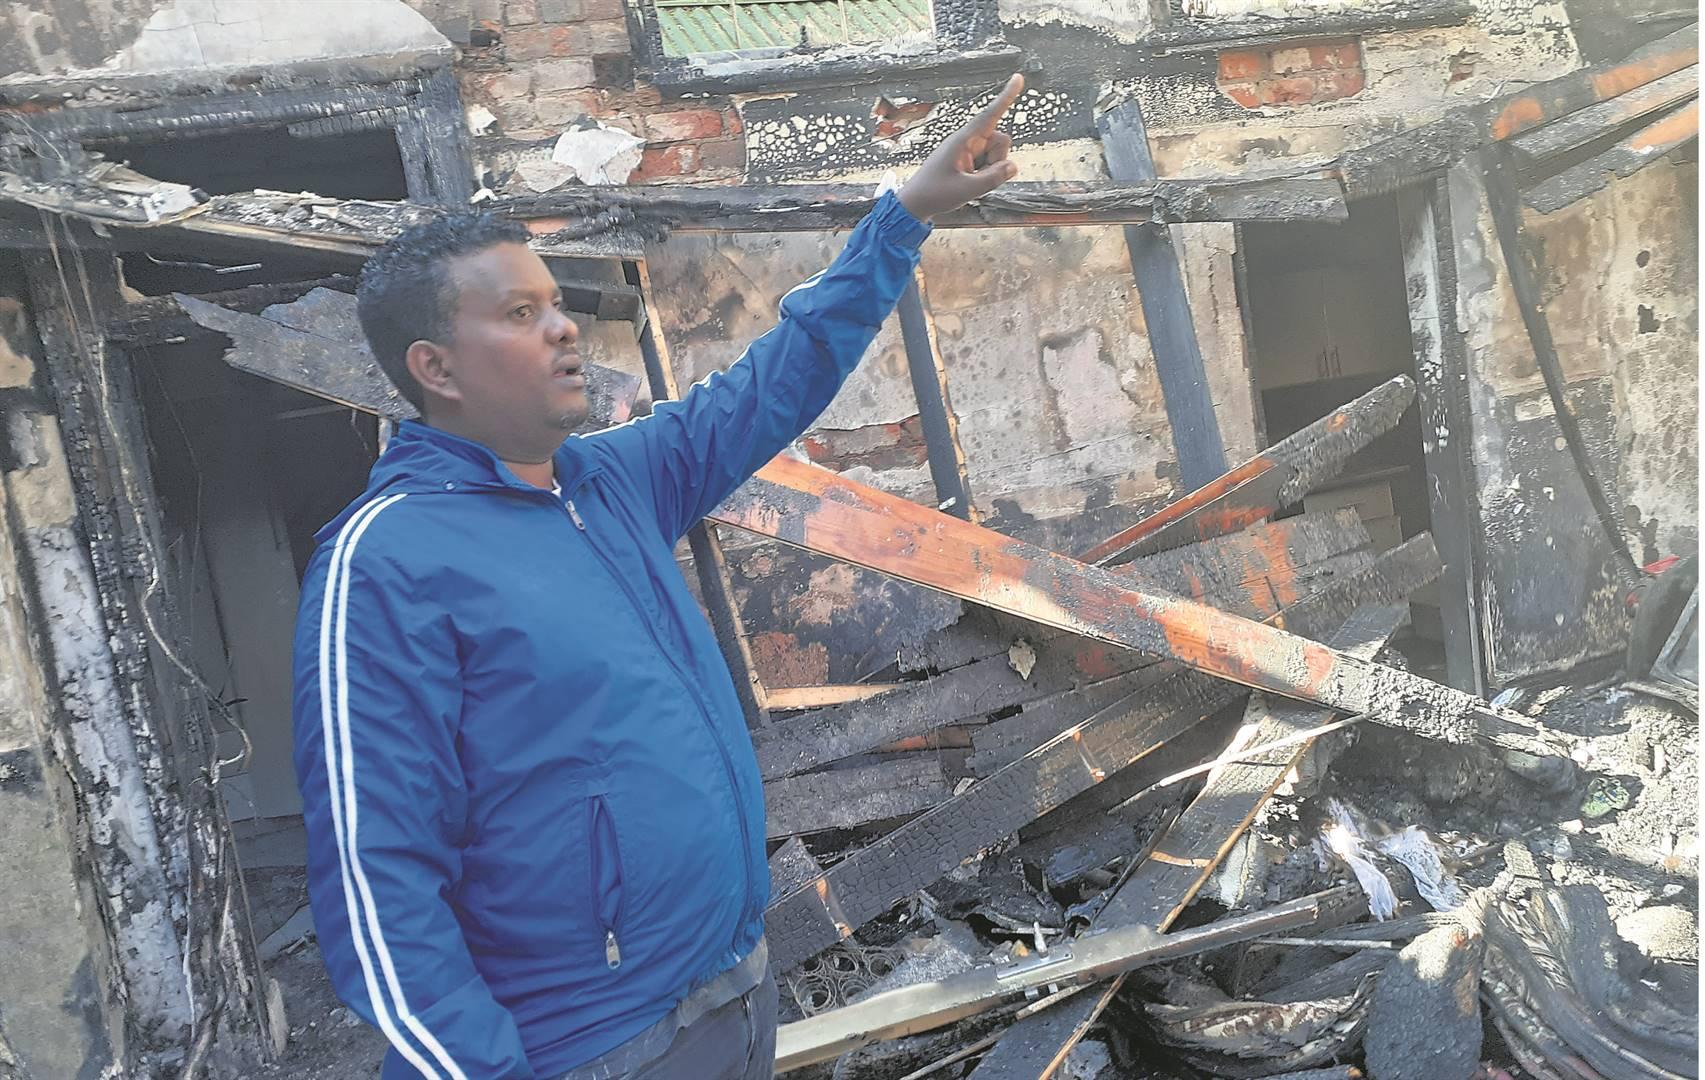 Serawit Demelew, secretary of Debre Bisrat St Gabriel Ethiopian Orthodox Church in Durban, surveys what is left of the building after it burnt down.